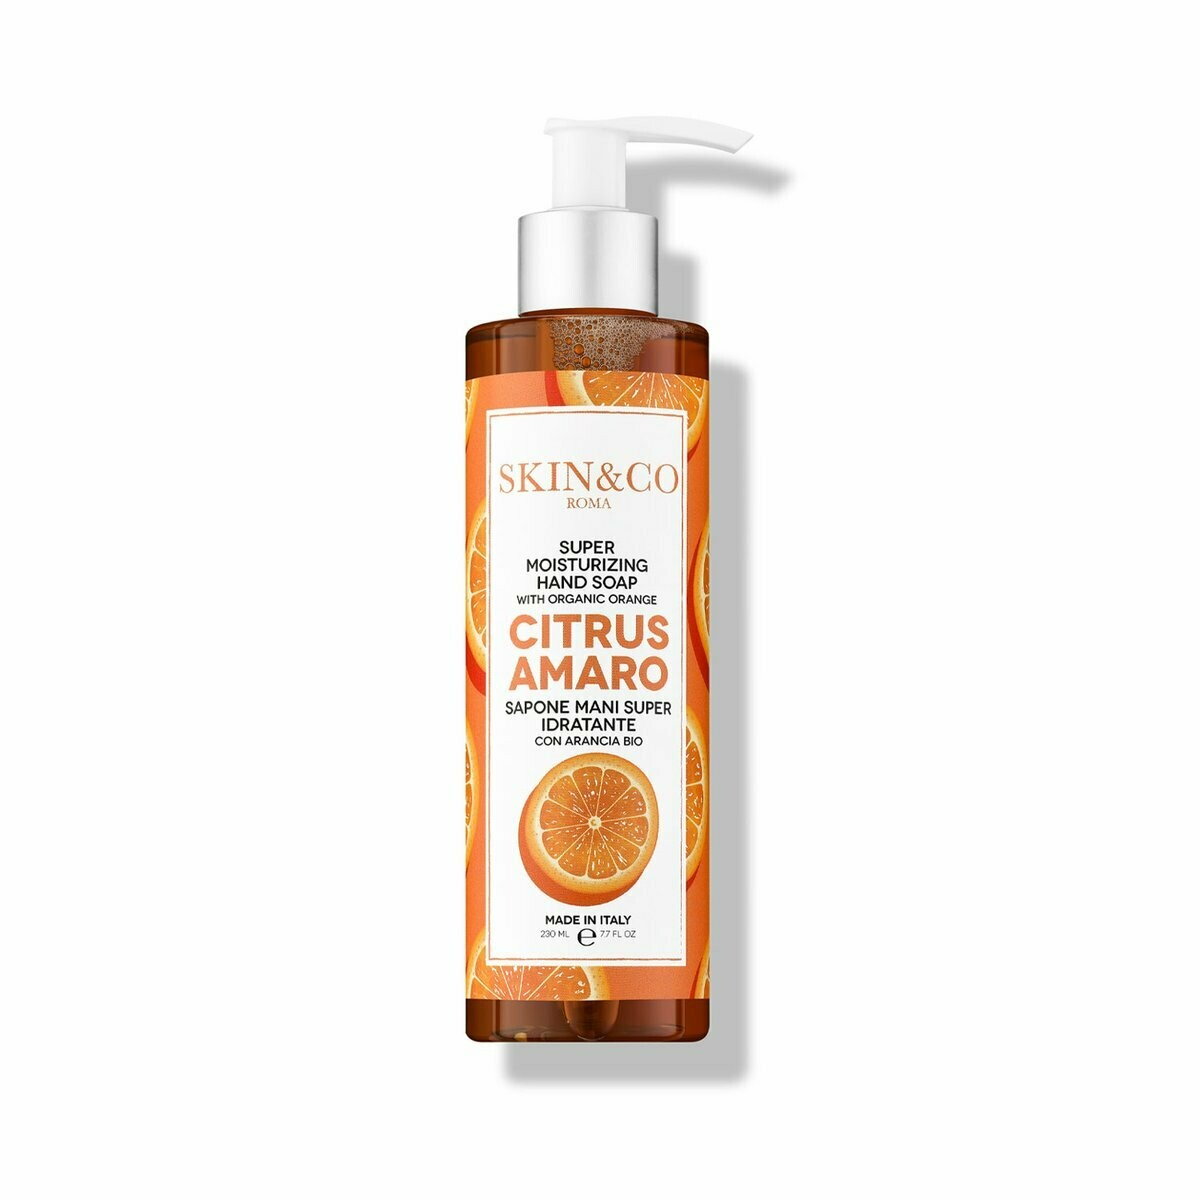 SKIN&CO Citrus Amaro Hand Soap